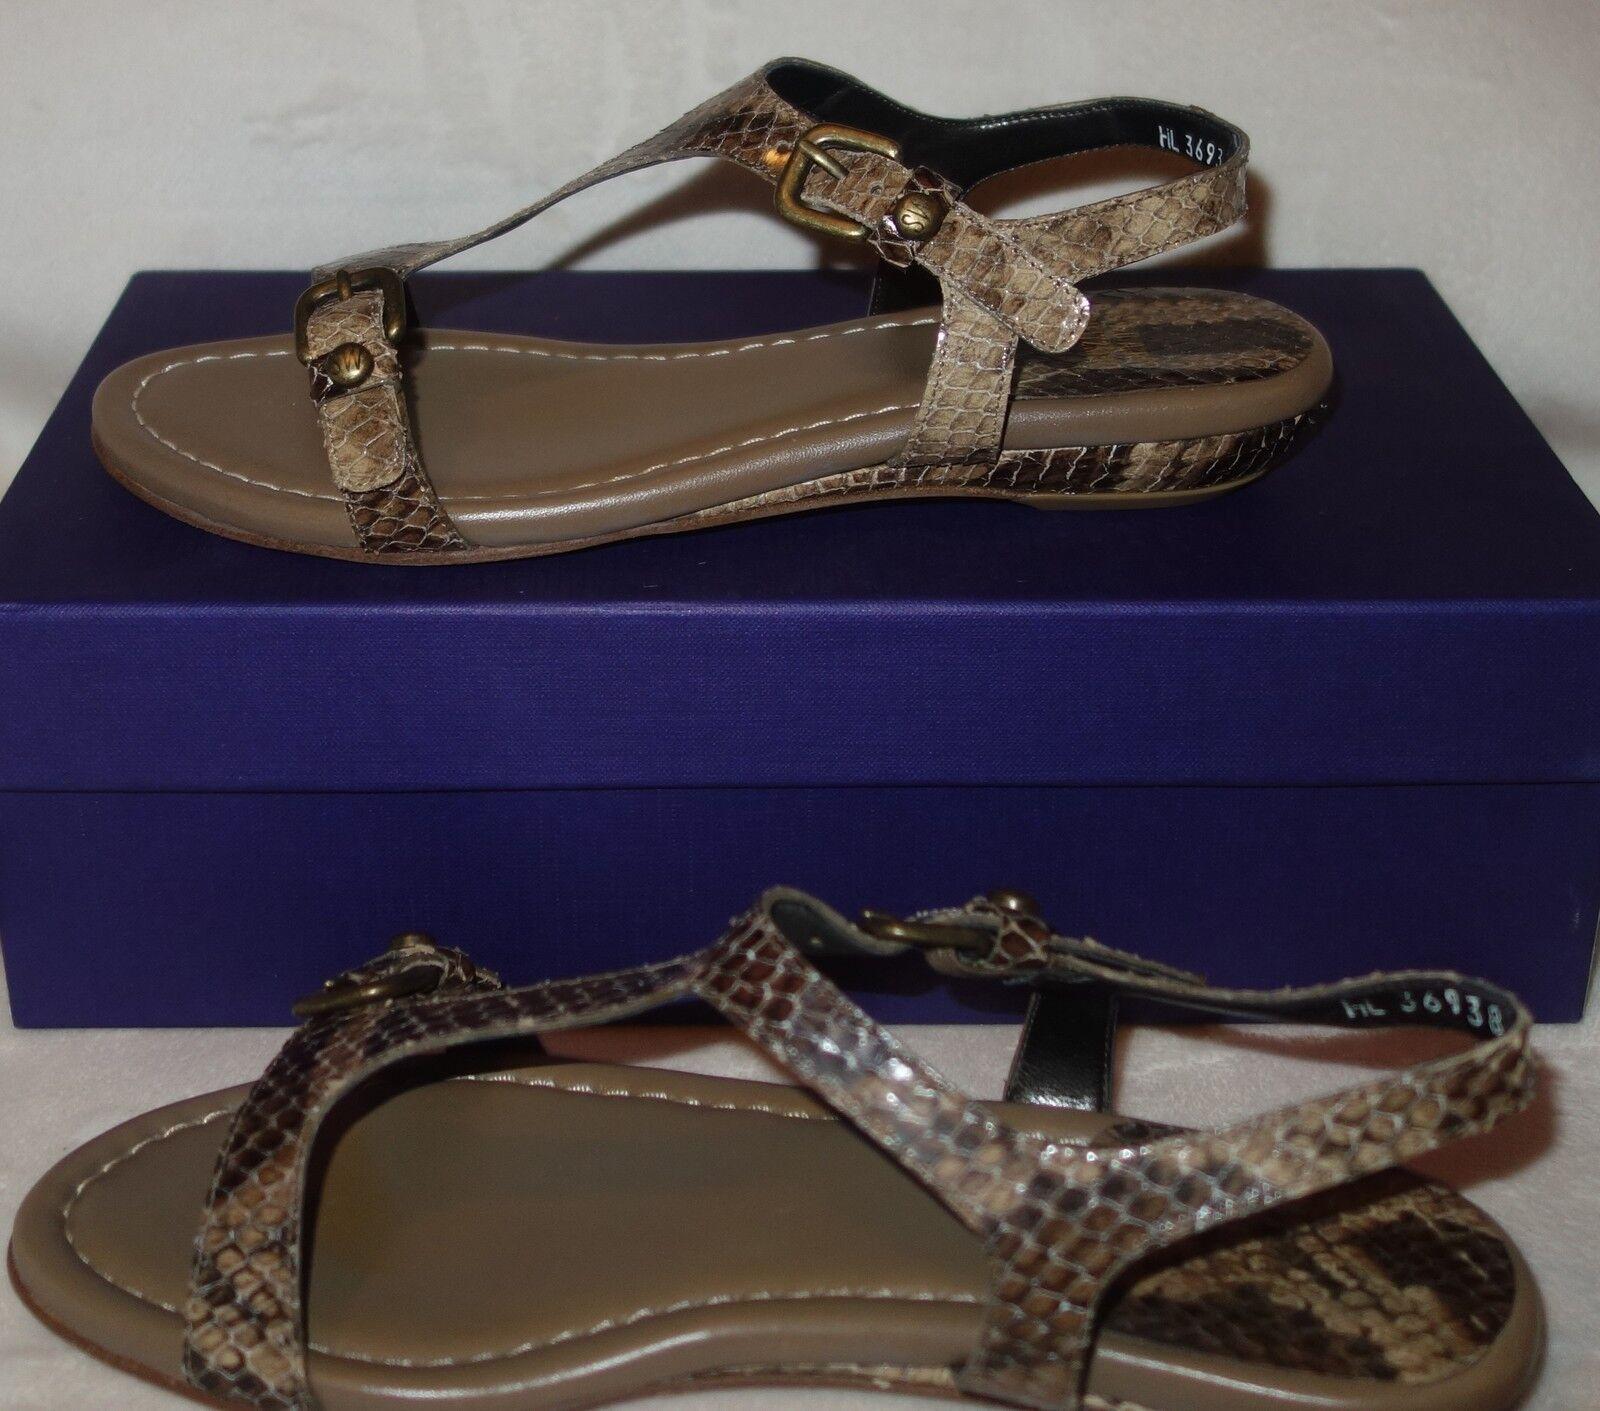 compra meglio Stuart Weitzman Weitzman Weitzman lifestyle leather sandals sz 36.5 US SZ 6  new  migliore offerta